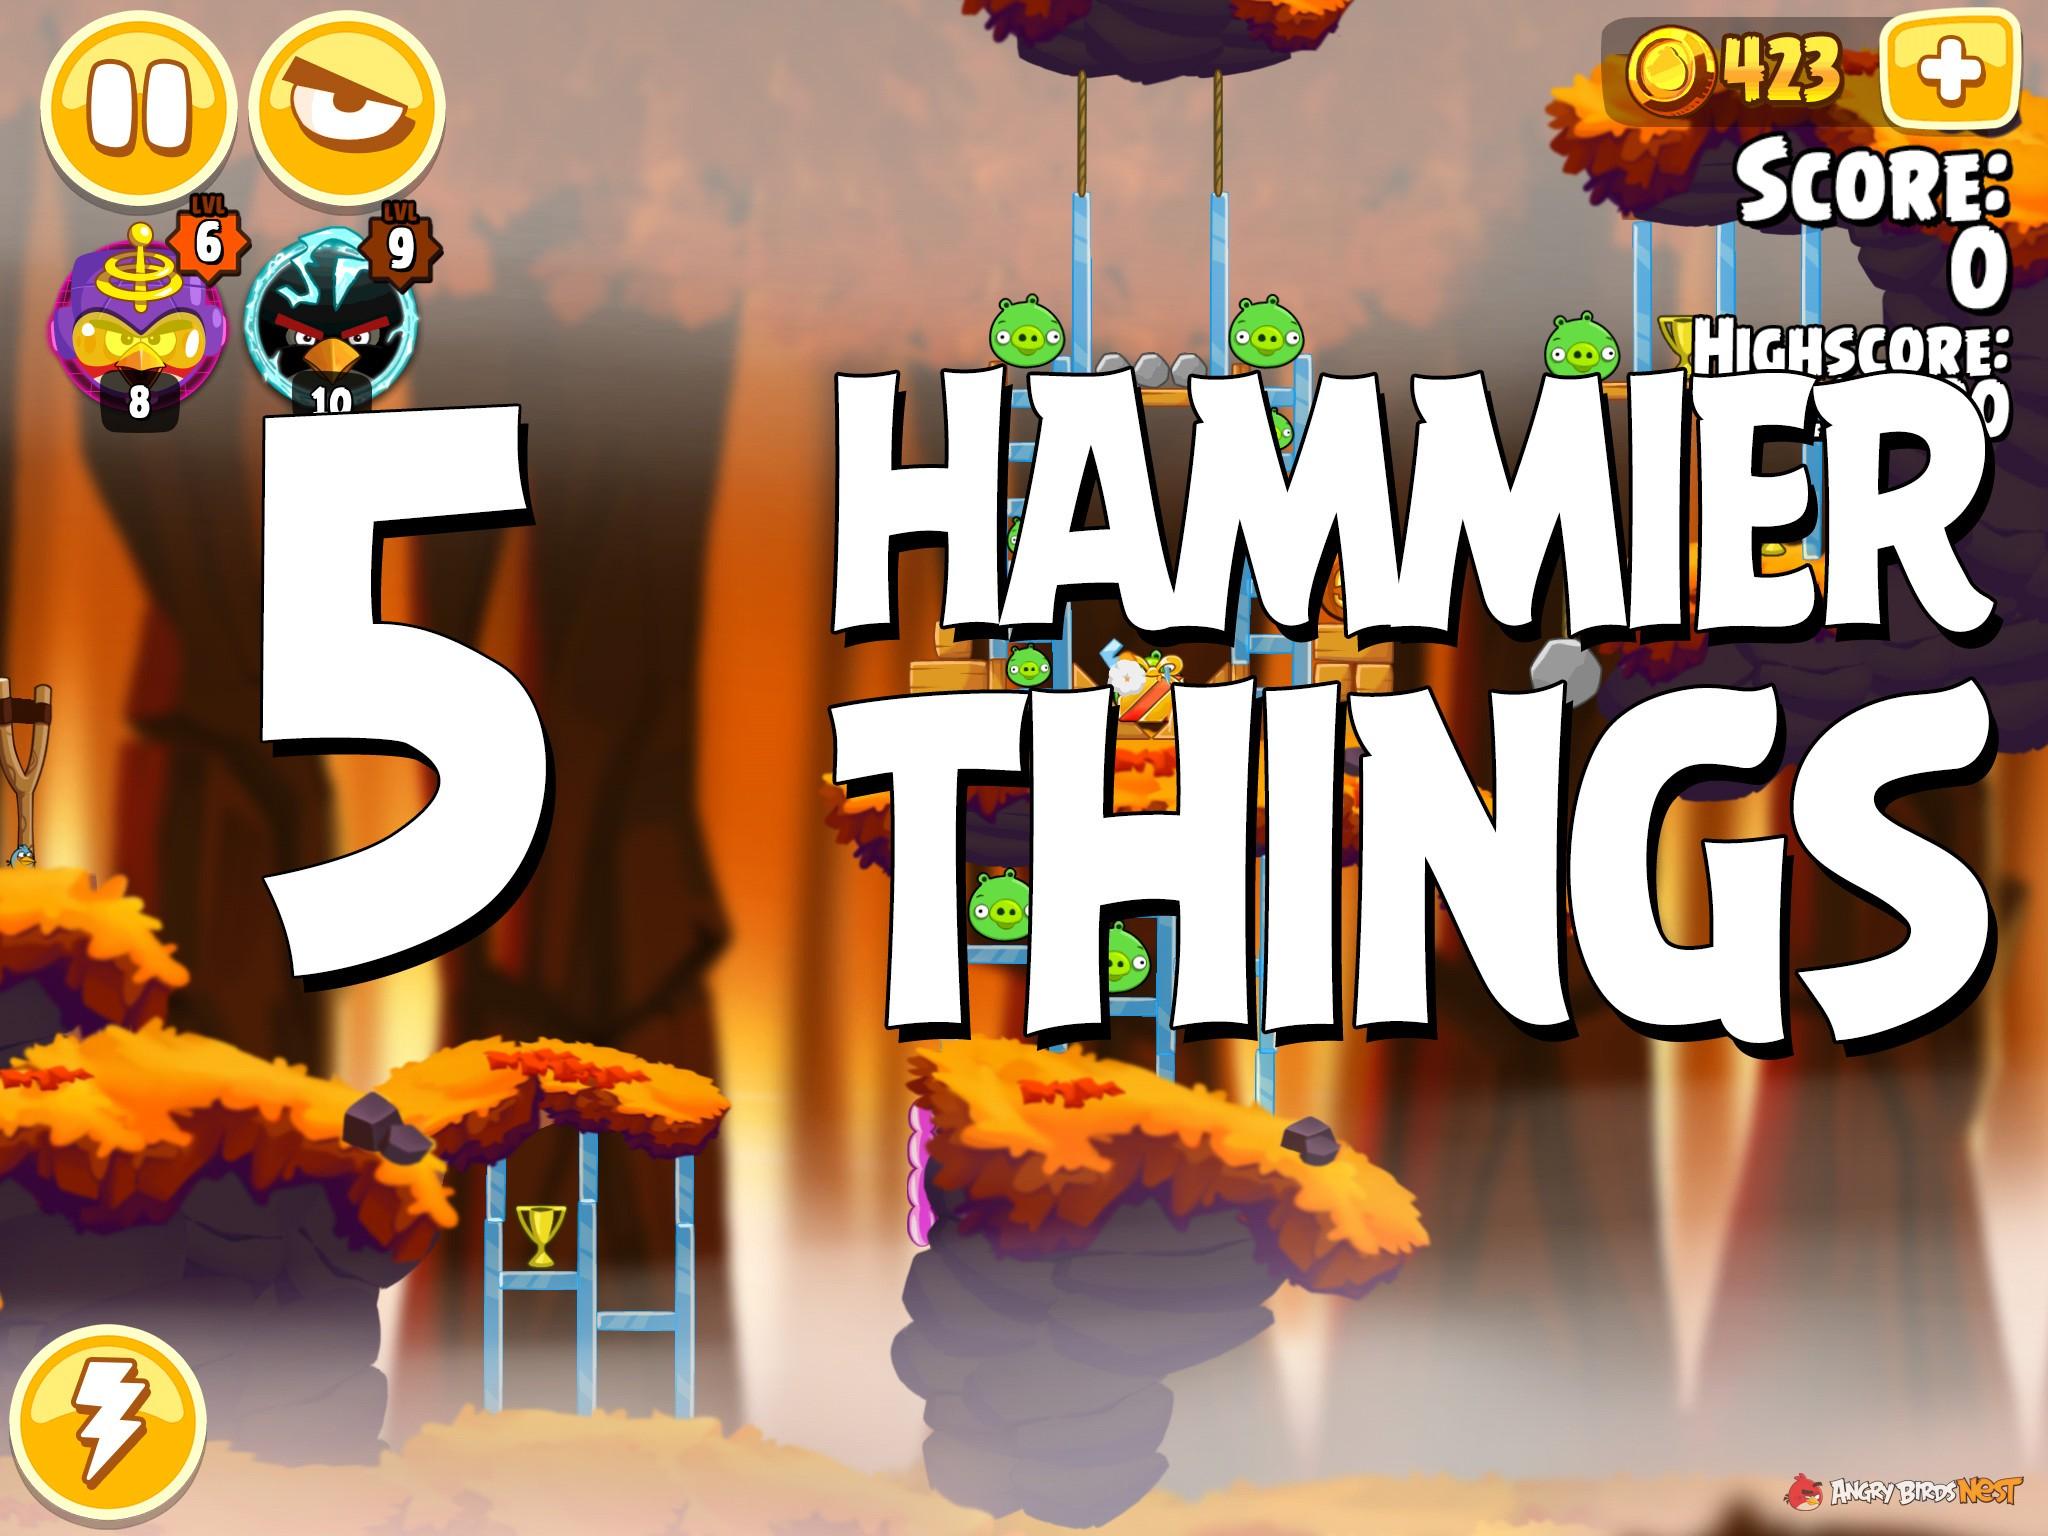 Angry Birds Hammier Things angry birds seasons hammier things level 1-5 walkthrough